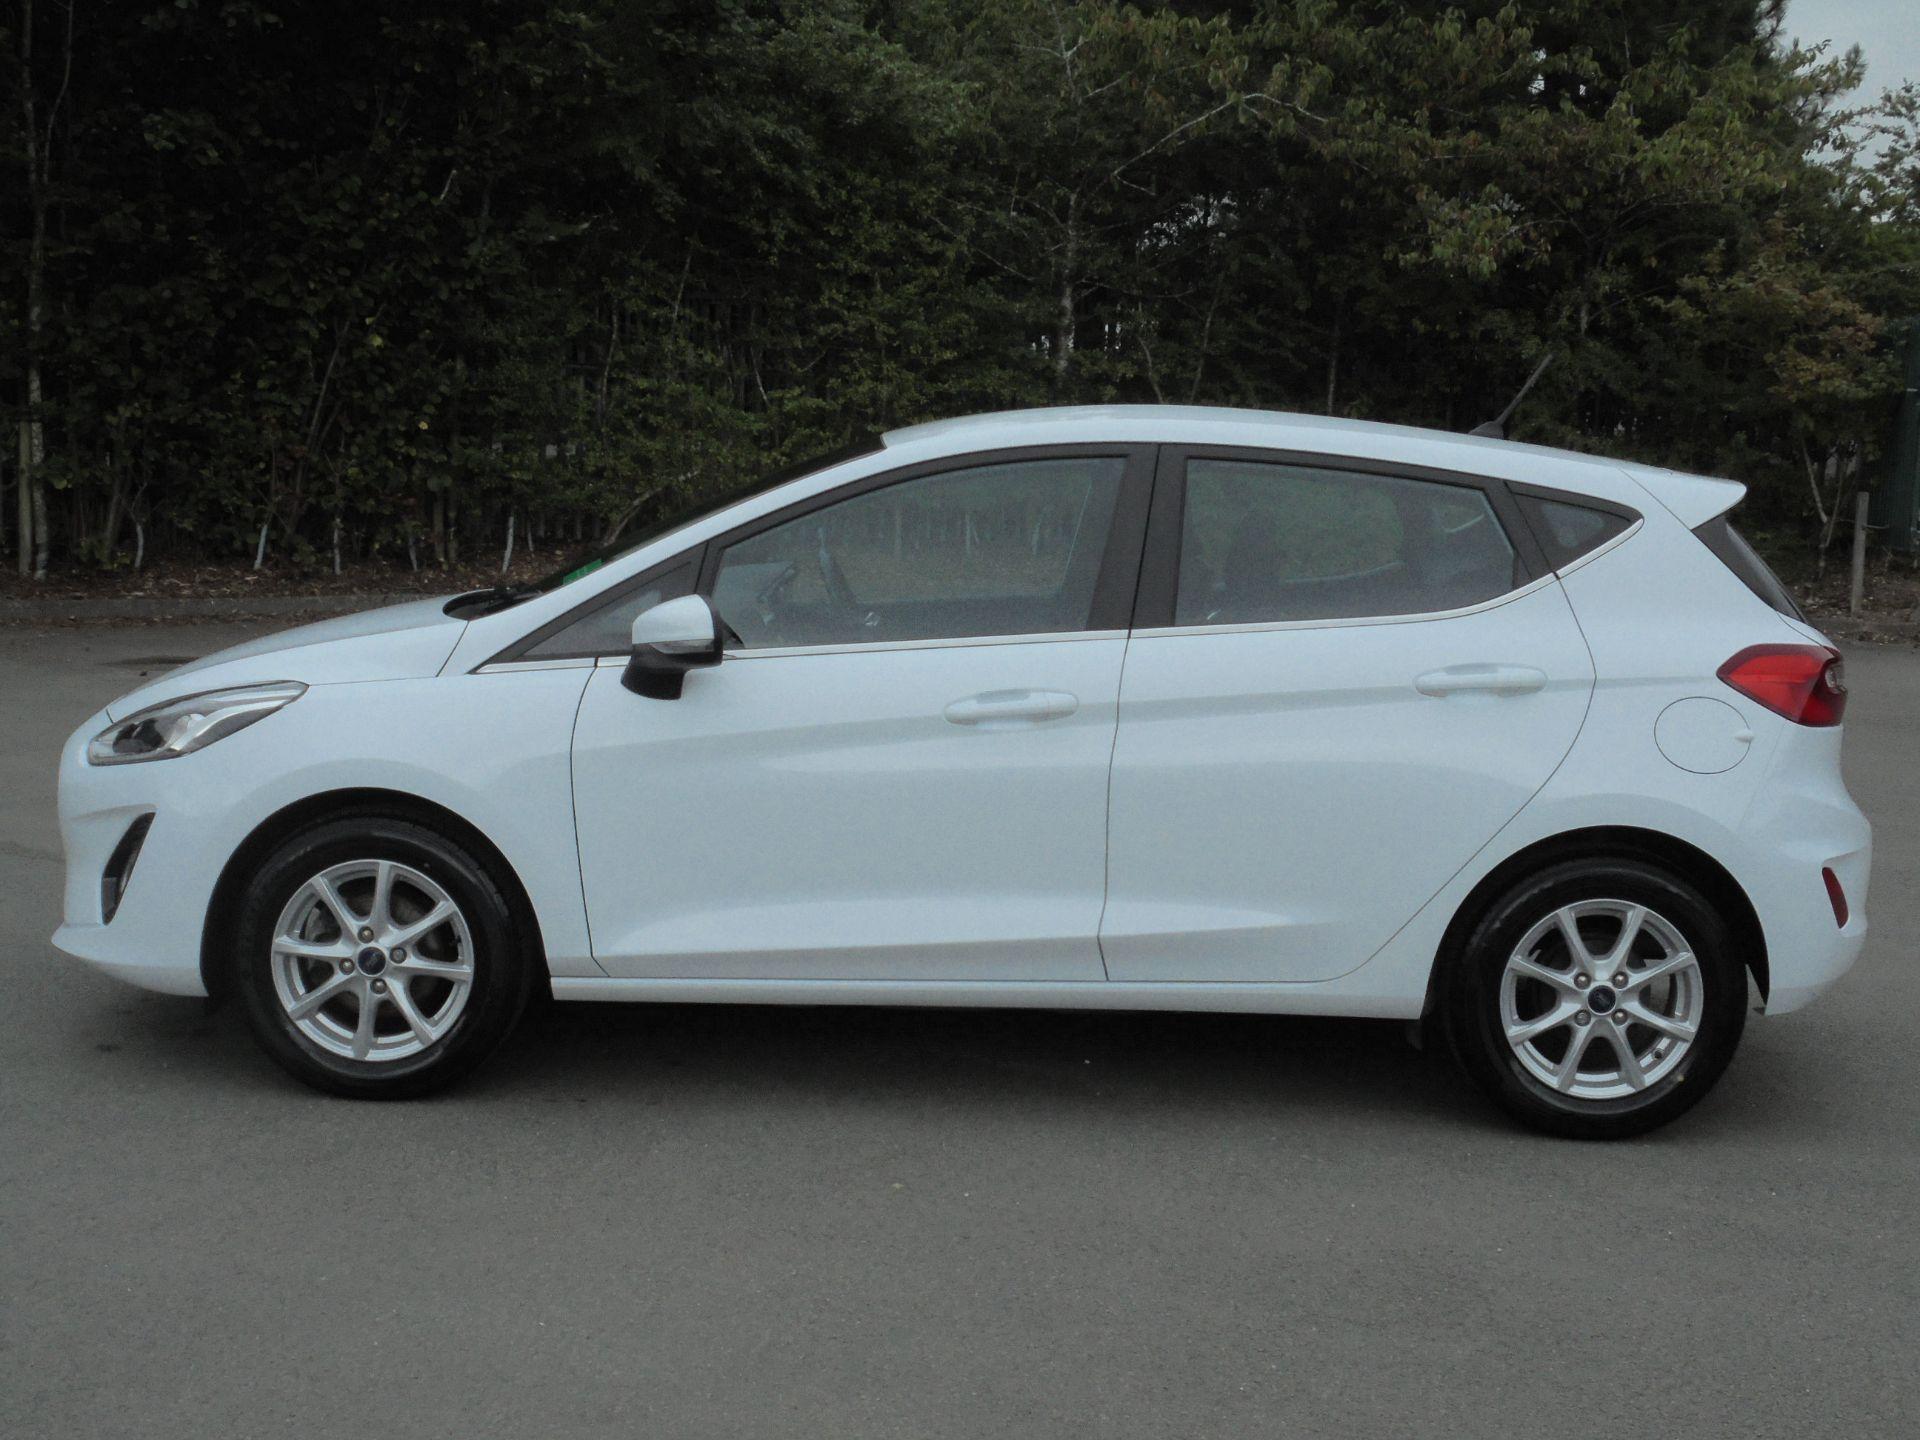 2018 Ford Fiesta 1.5 Tdci Zetec 5Dr (FD18WHU) Image 4